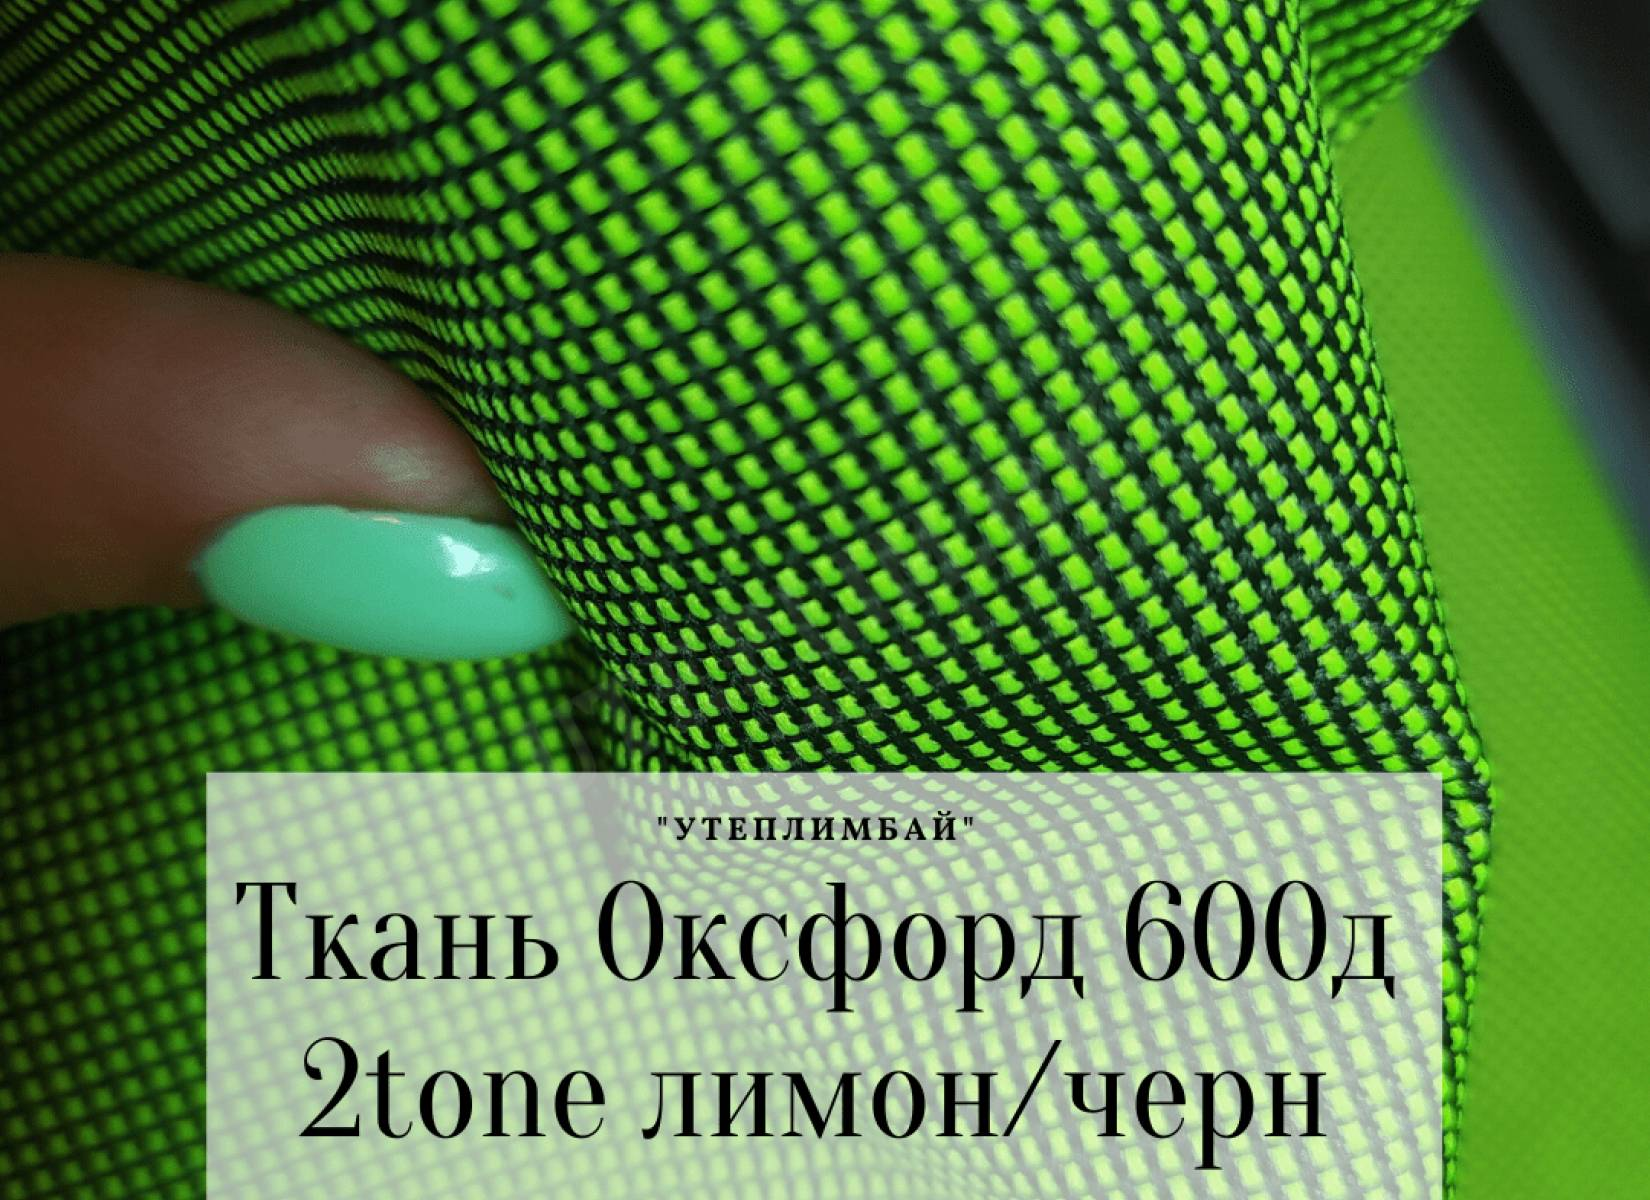 600д 2tone - лимон/черн